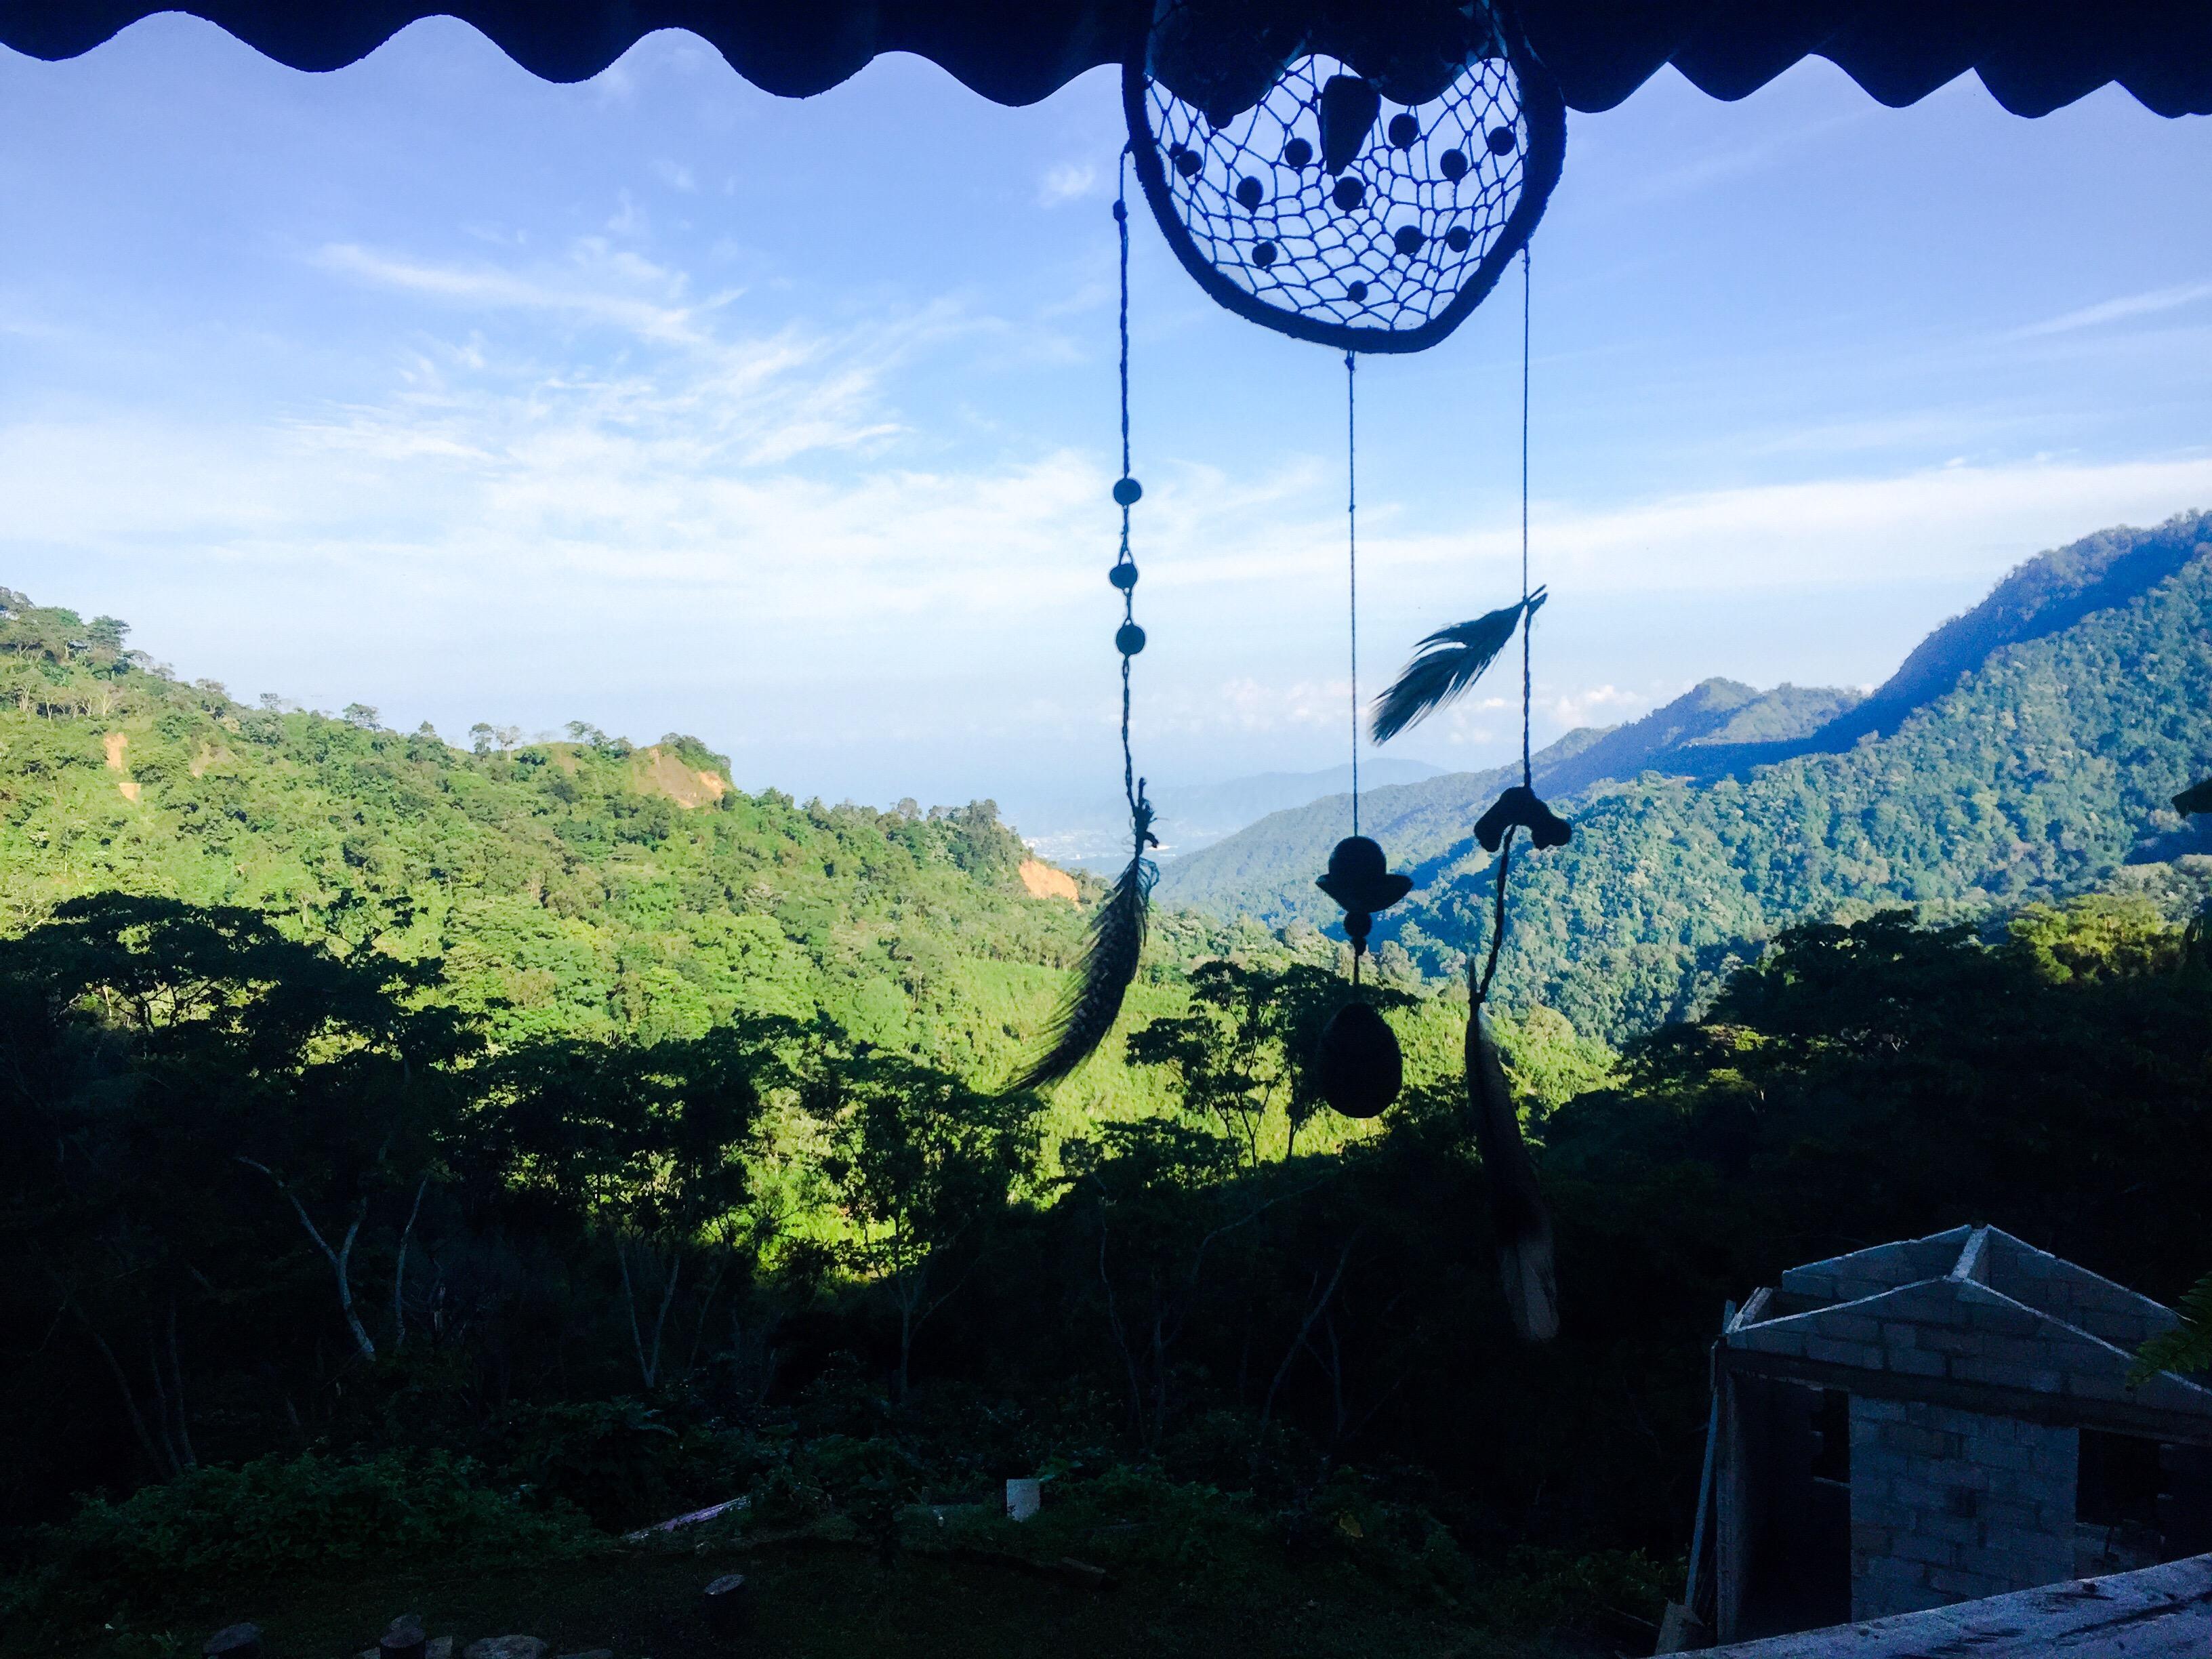 Beautiful view from Casas Viejas